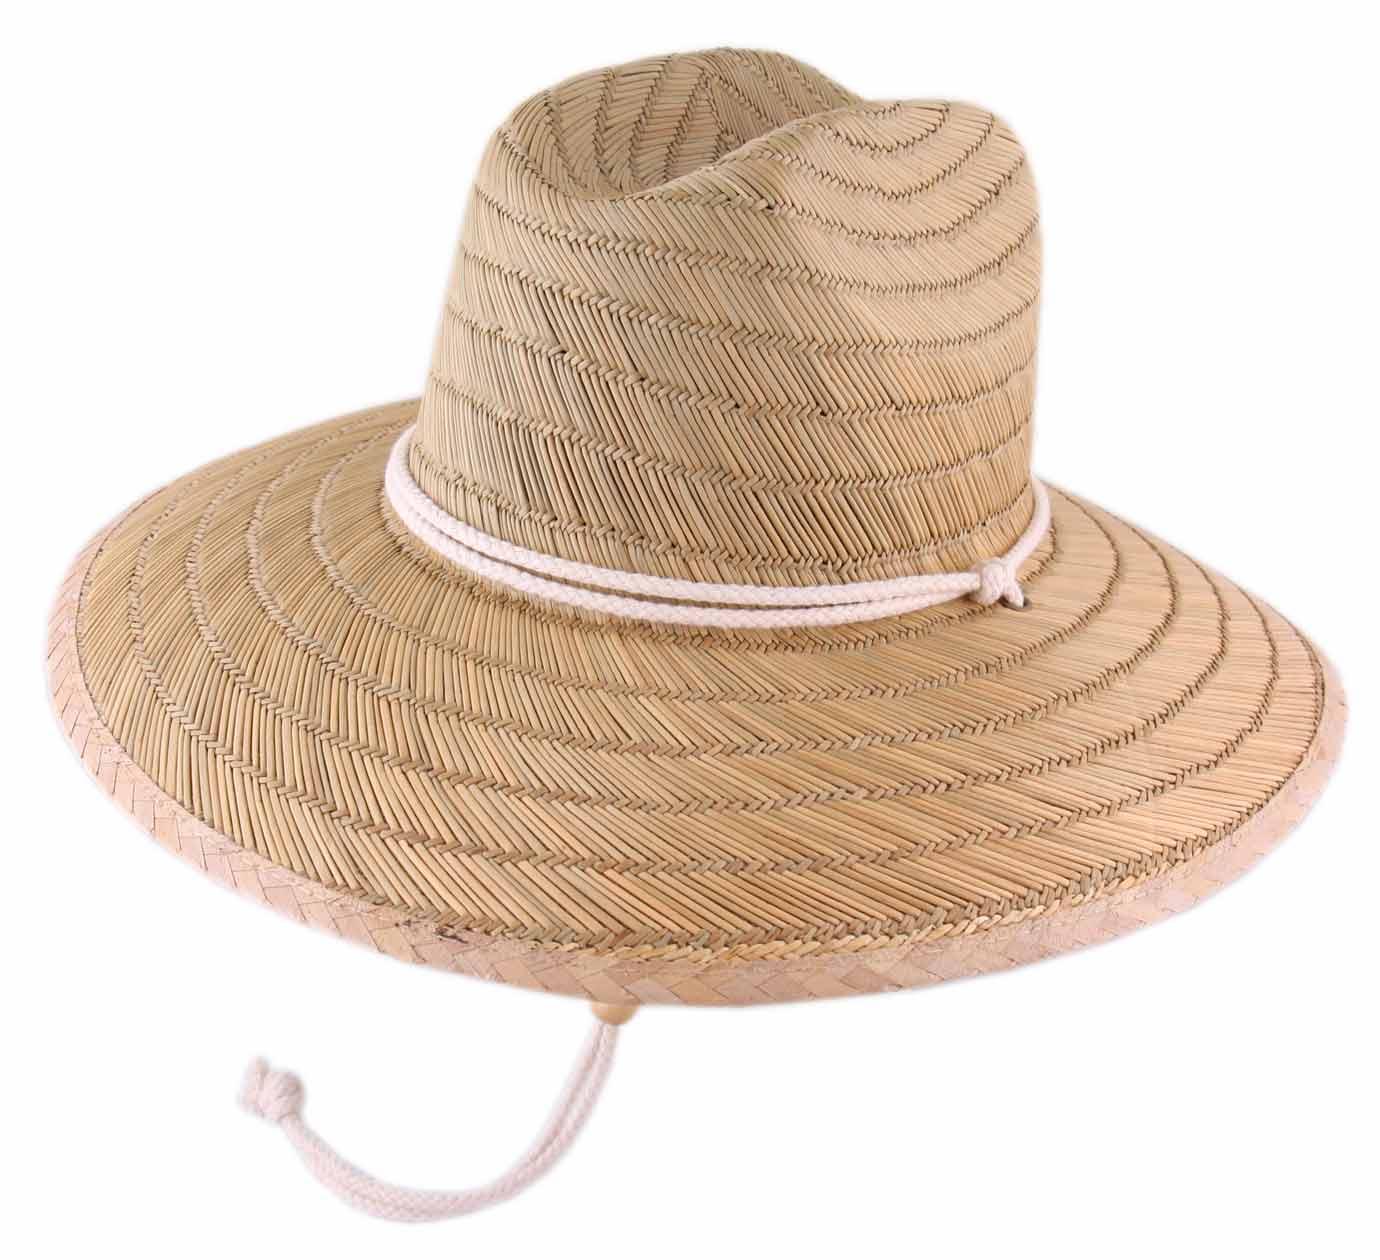 Molokai - Hats Peter Grimm 1cea5a1c36a